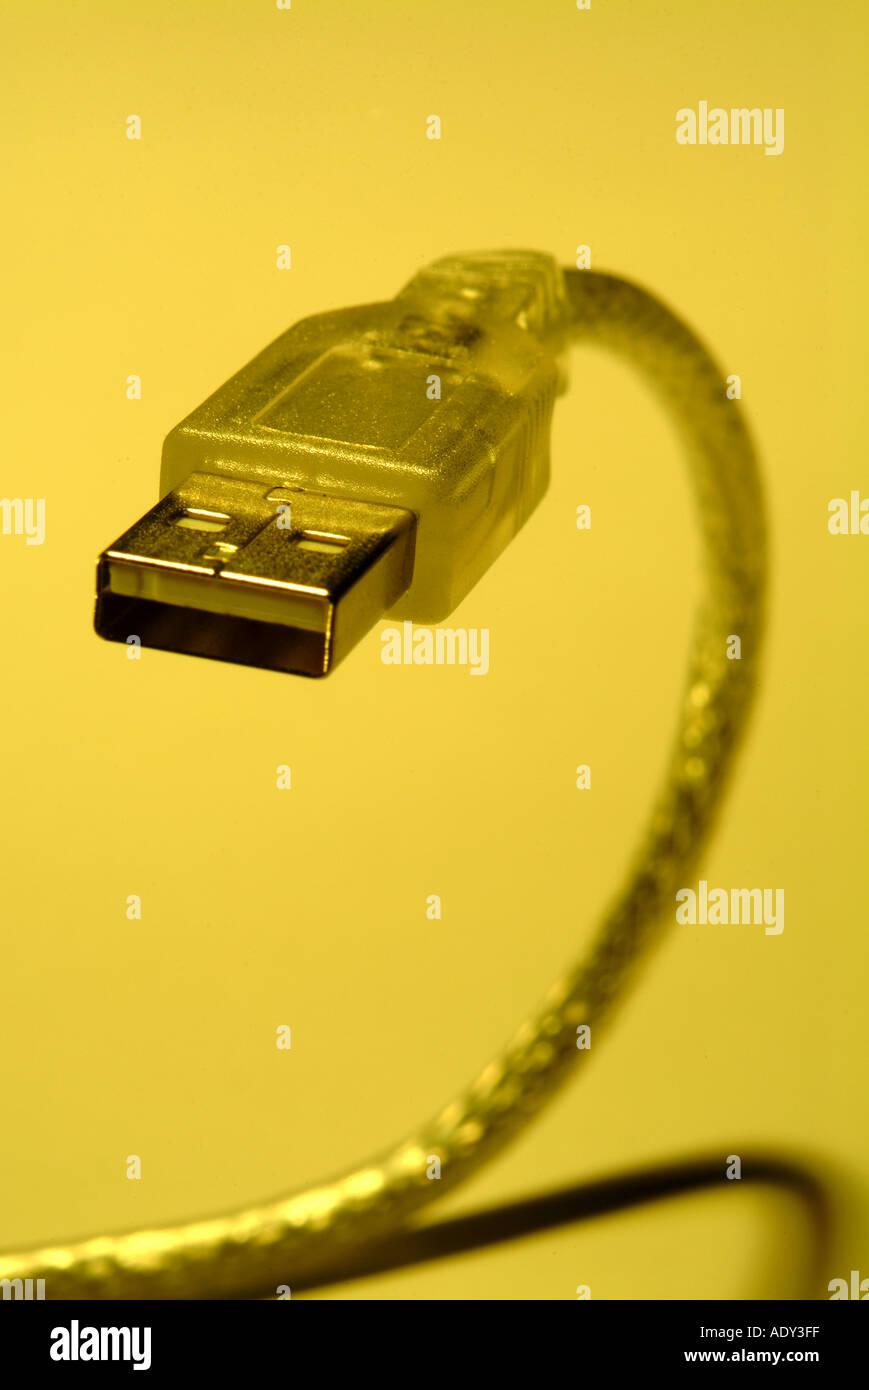 Großzügig Elektronische Symbolbibliothek Fotos - Schaltplan Serie ...